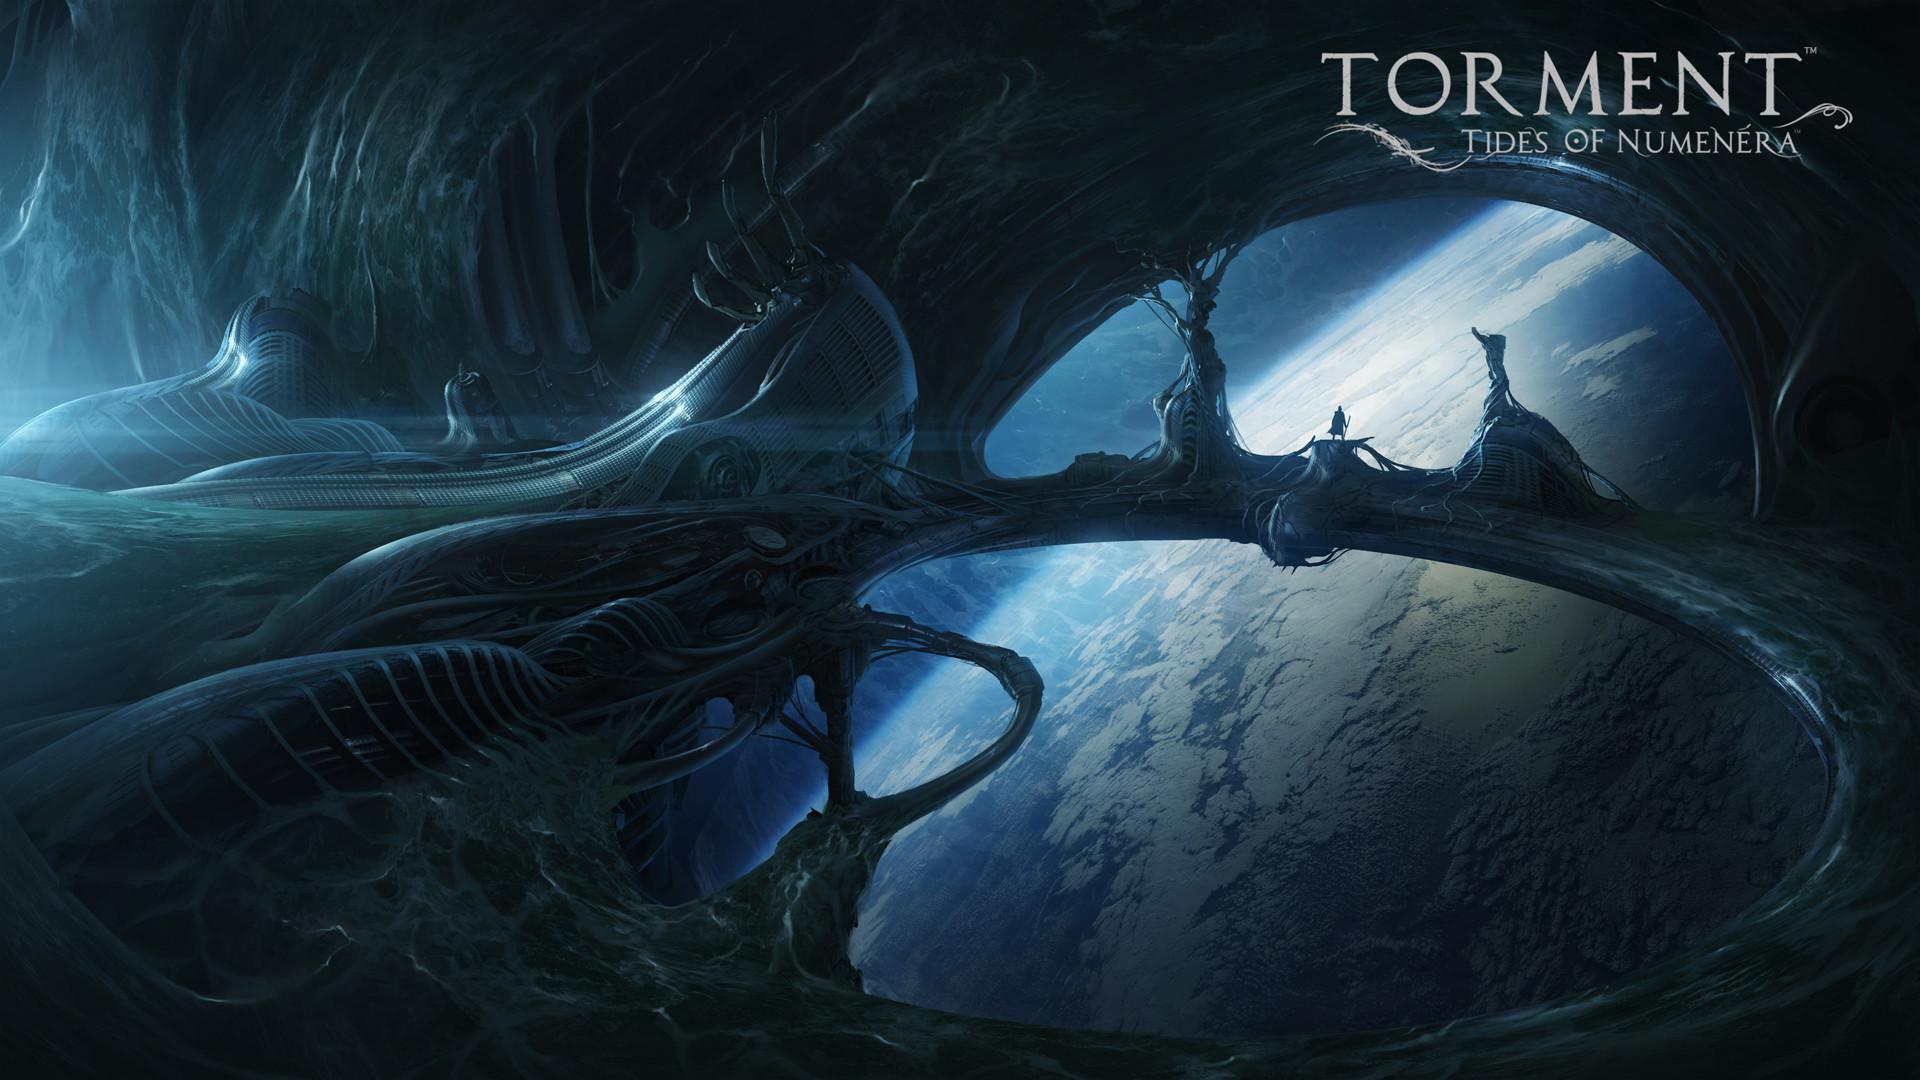 Torment: Tides of Numenera Beta Release Dates Announced